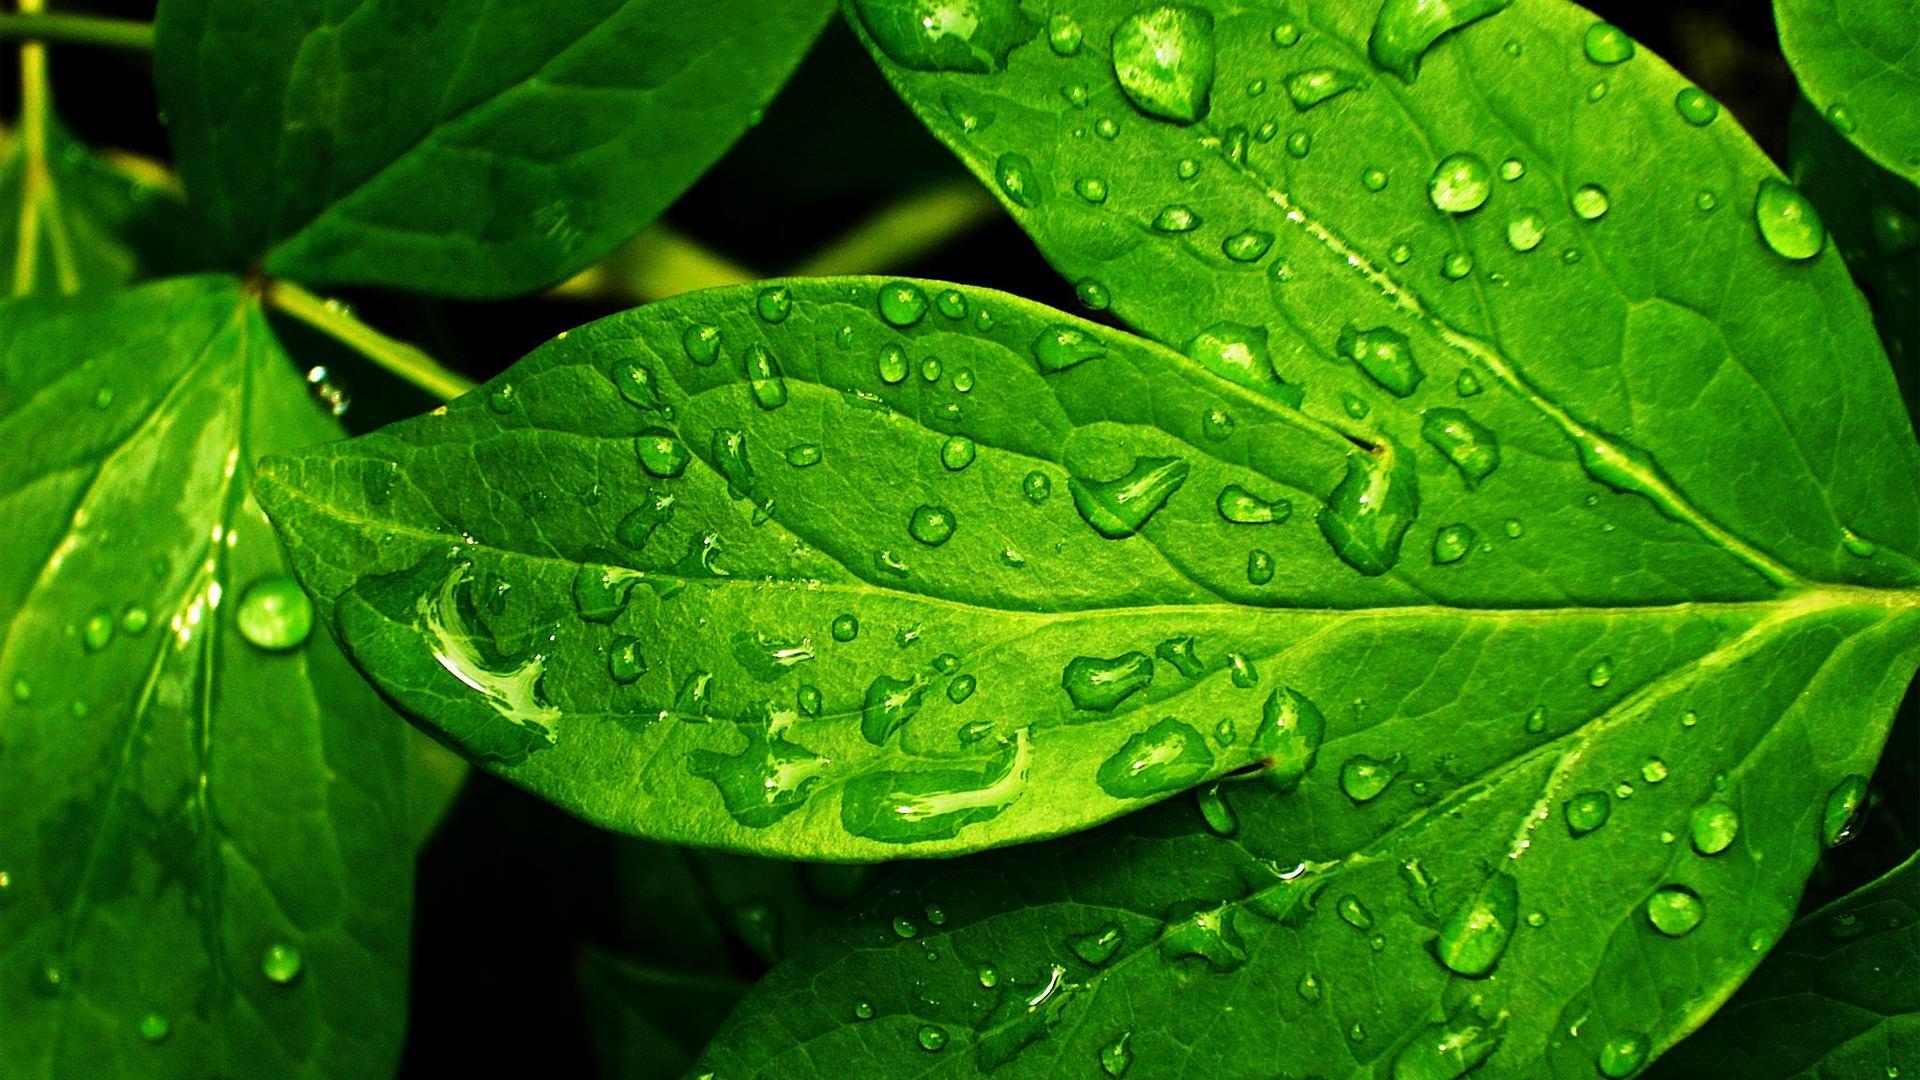 stunning green nature background